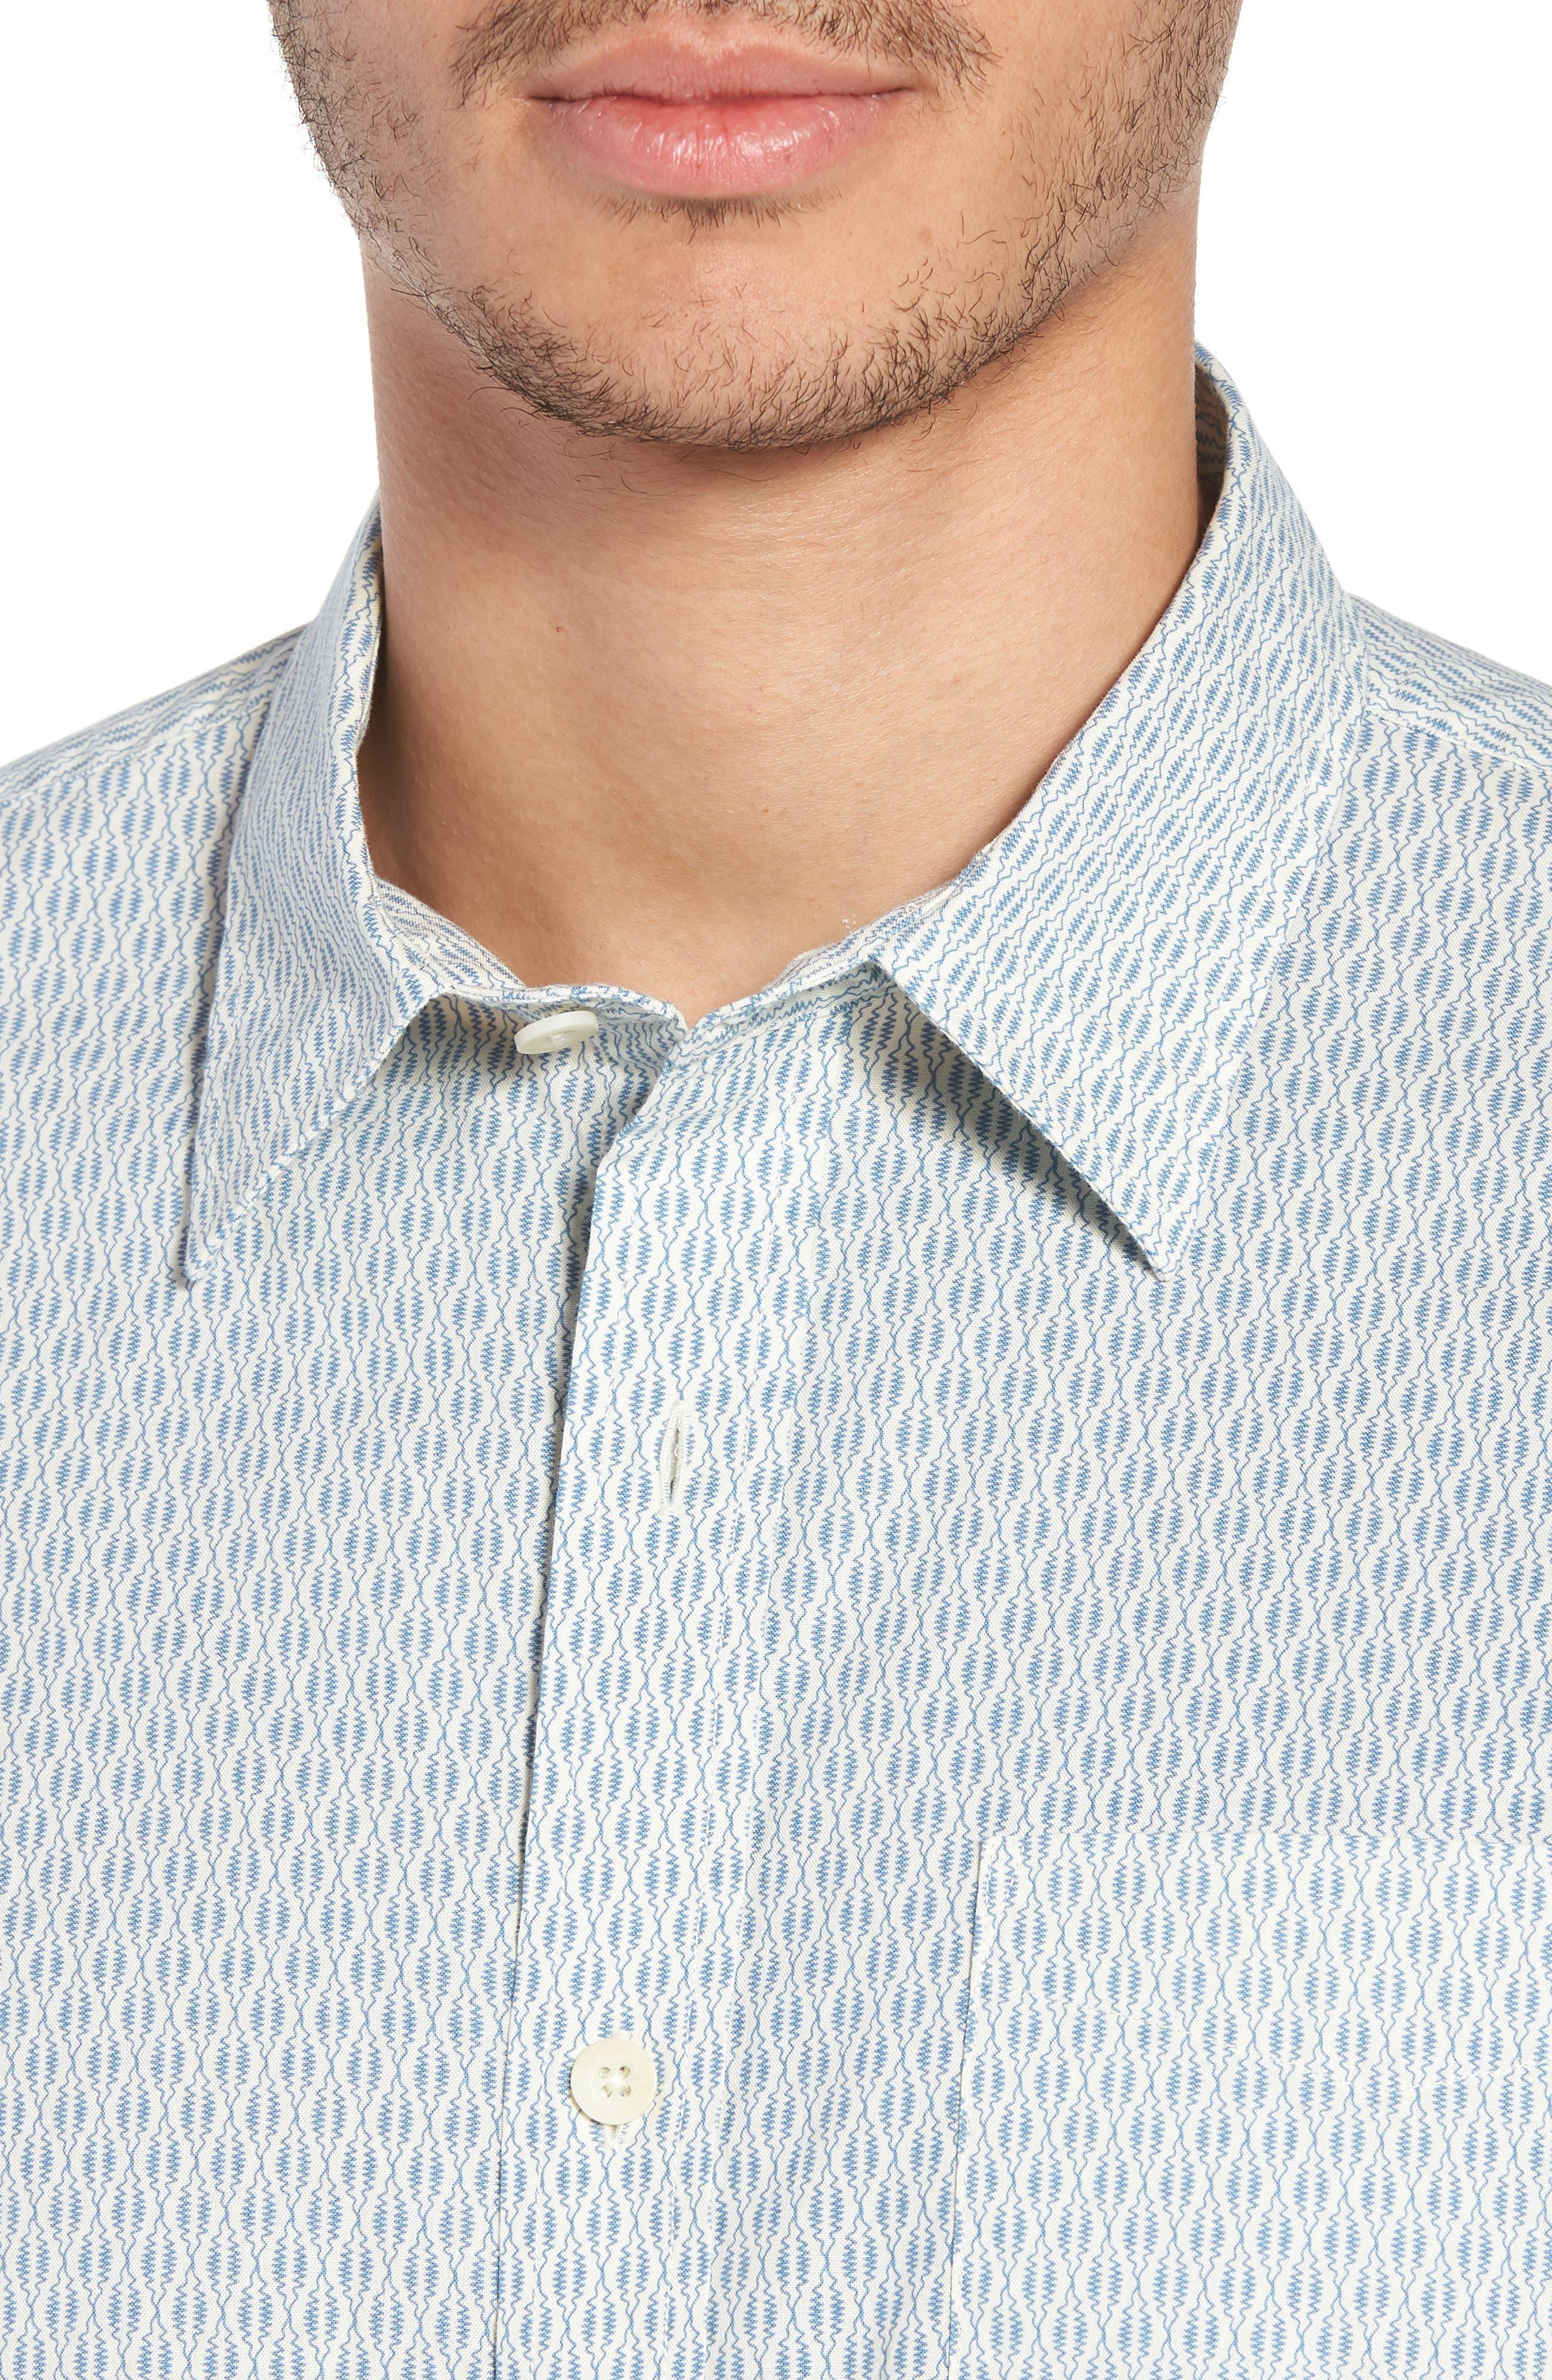 Regular Fit Print Short Sleeve Sport Shirt,                             Alternate thumbnail 4, color,                             VINTAGE NAVY SQUIGGLE